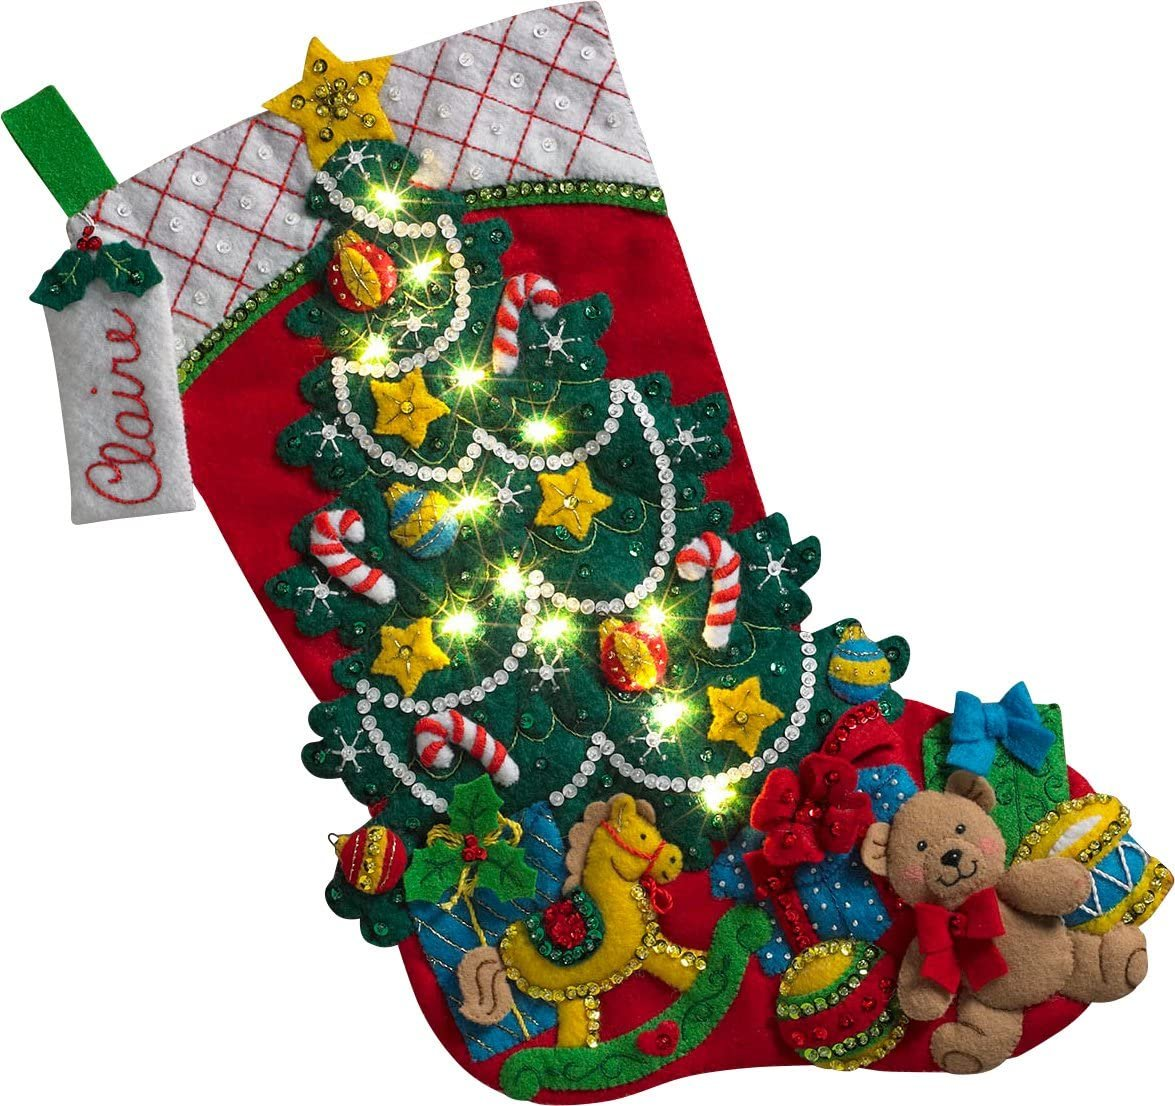 Bucilla Christmas Tree Surprise - with lights